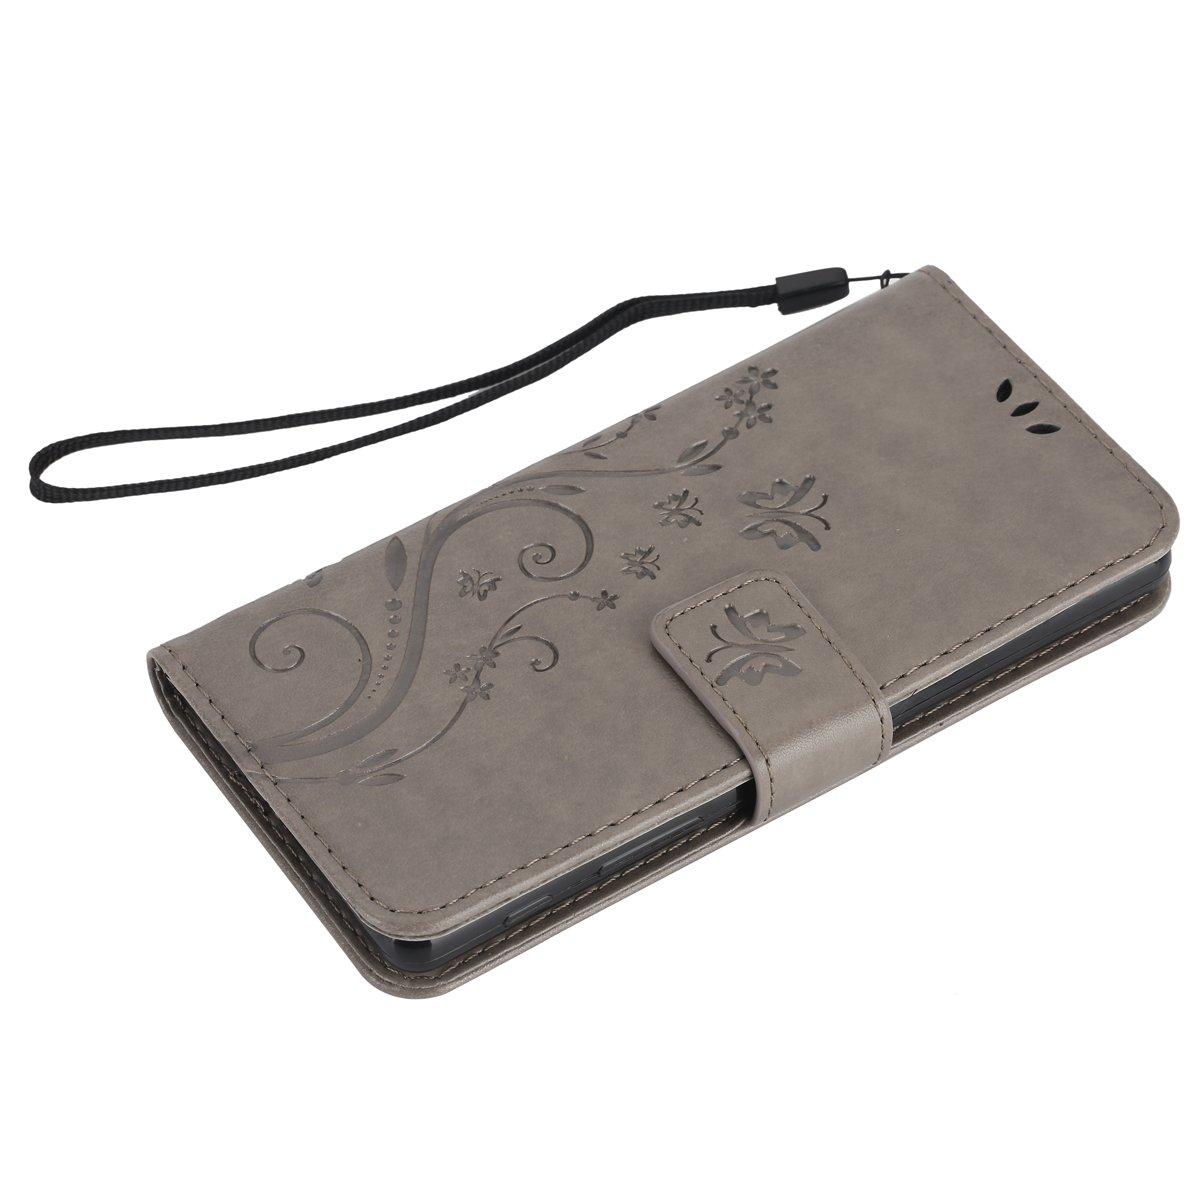 dise/ño de mariposa piel sint/ética plegable tipo cartera ikasus Sony Xperia X caso funda de piel tipo cartera con funci/ón atril tarjeta de Cr/édito ID soportes/ /Carcasa para Sony Xperia X